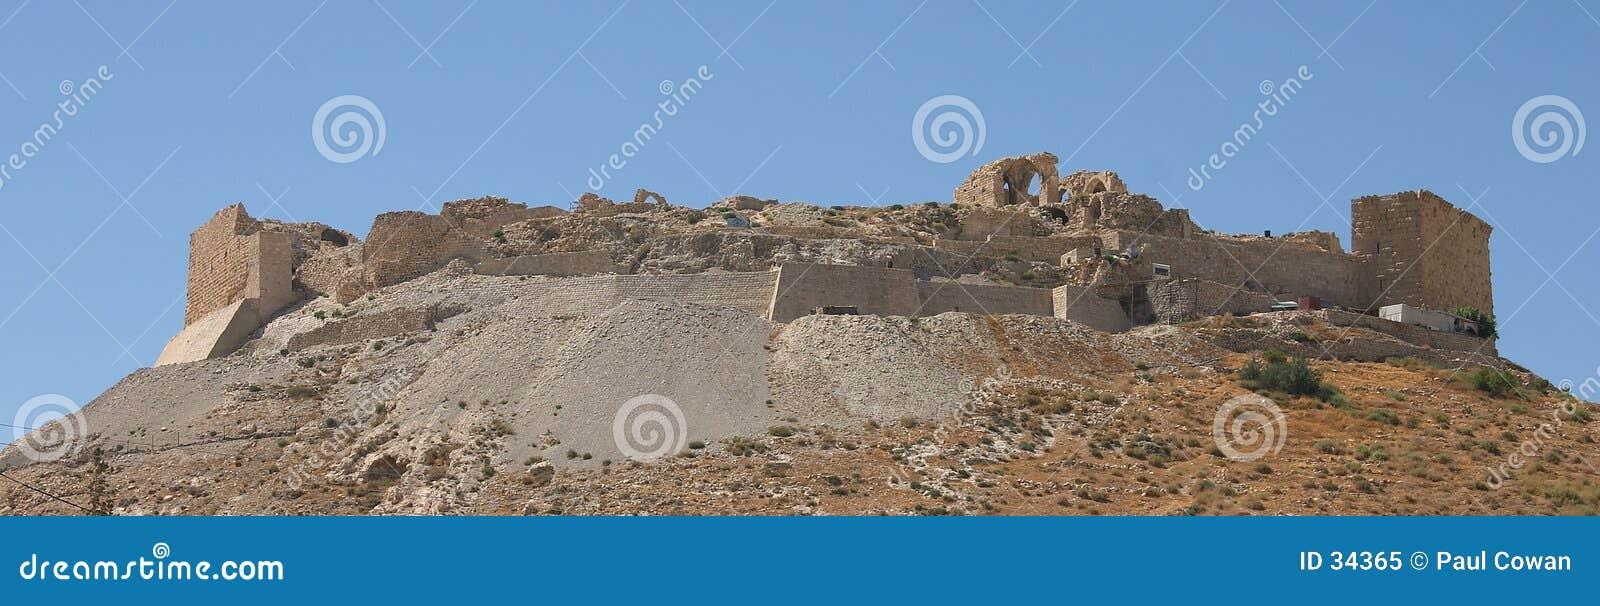 Slottjordan shawbak